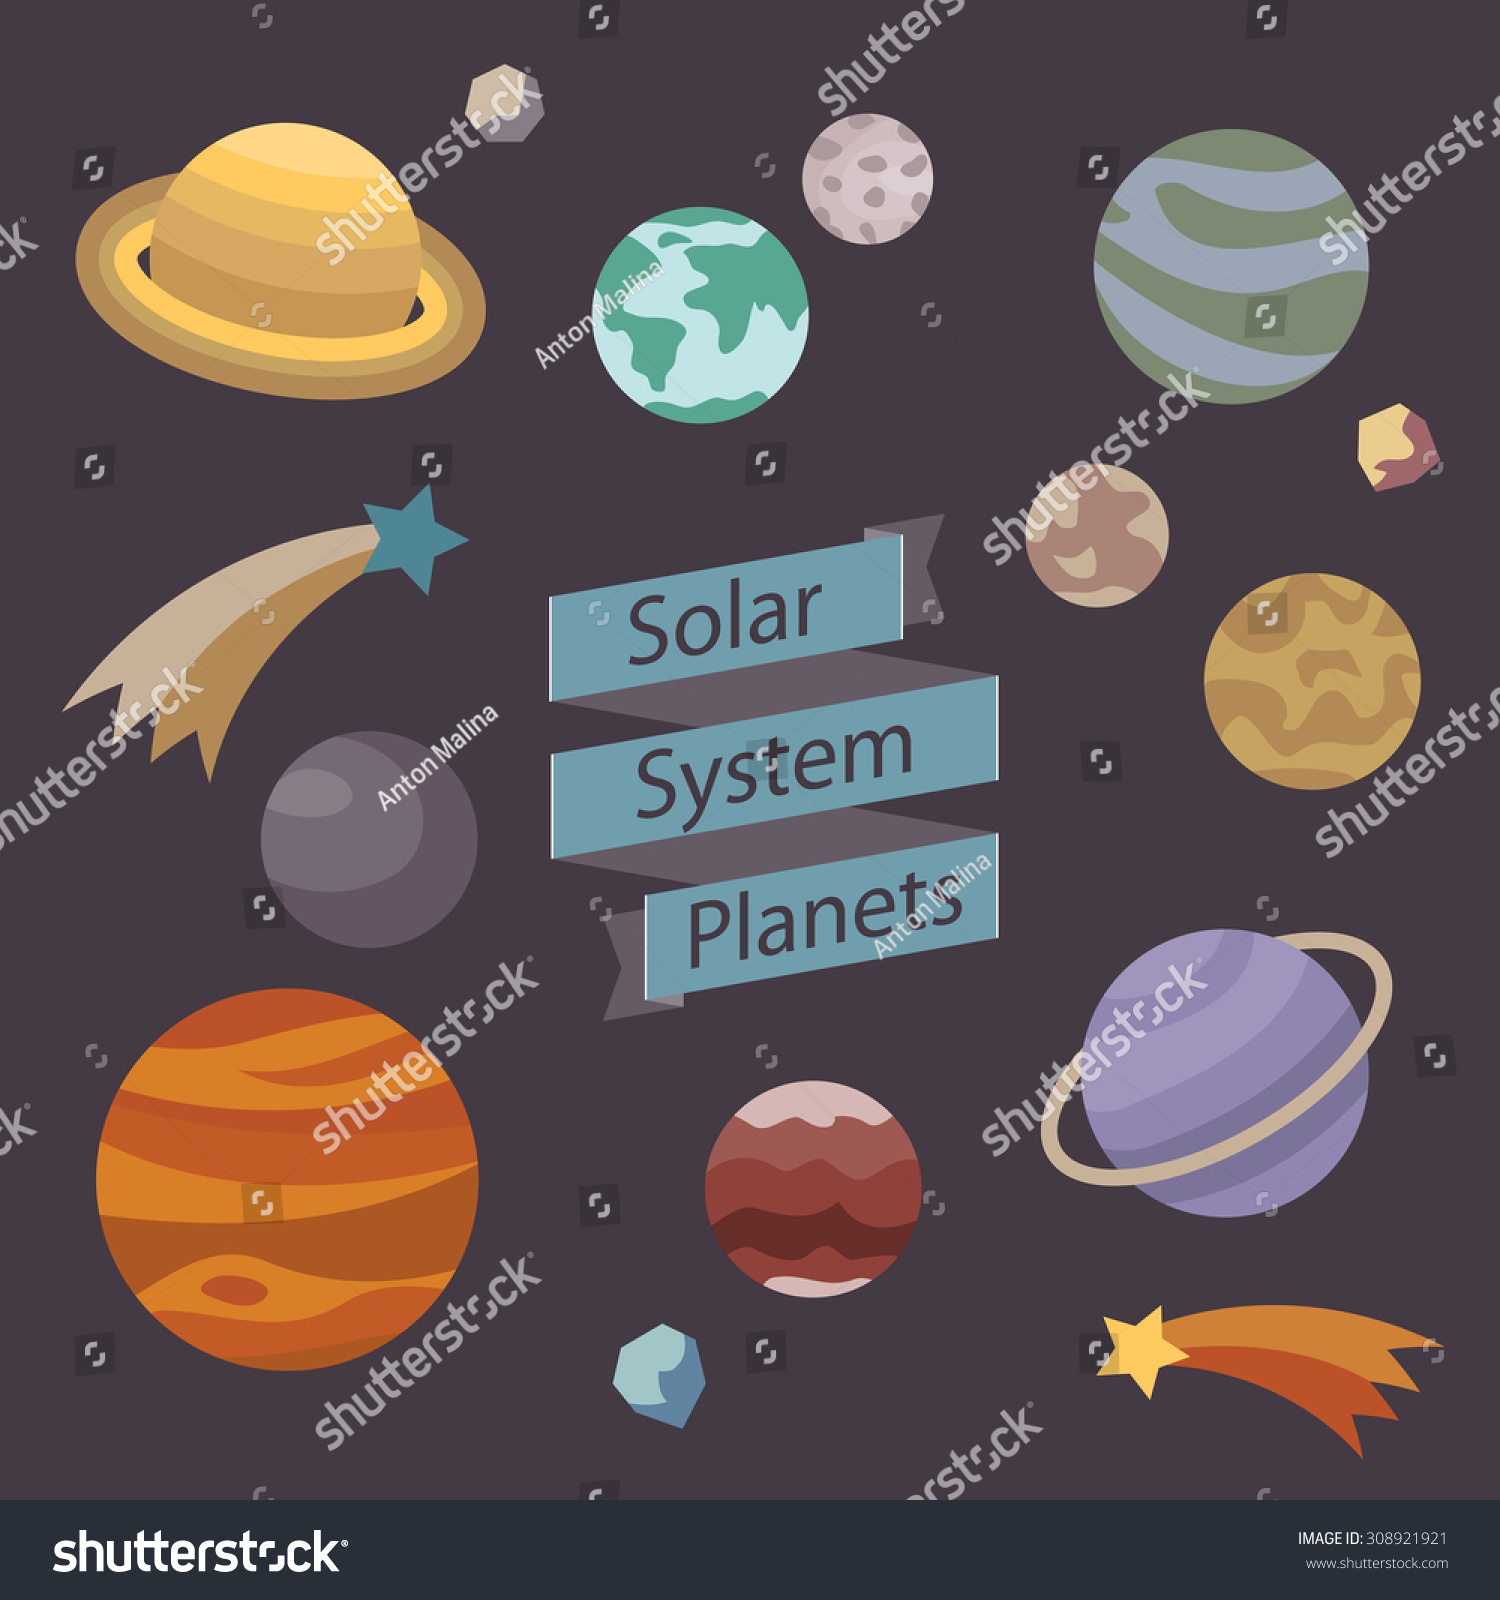 Solar System Planets Vector Illustration On Stock Vector ...